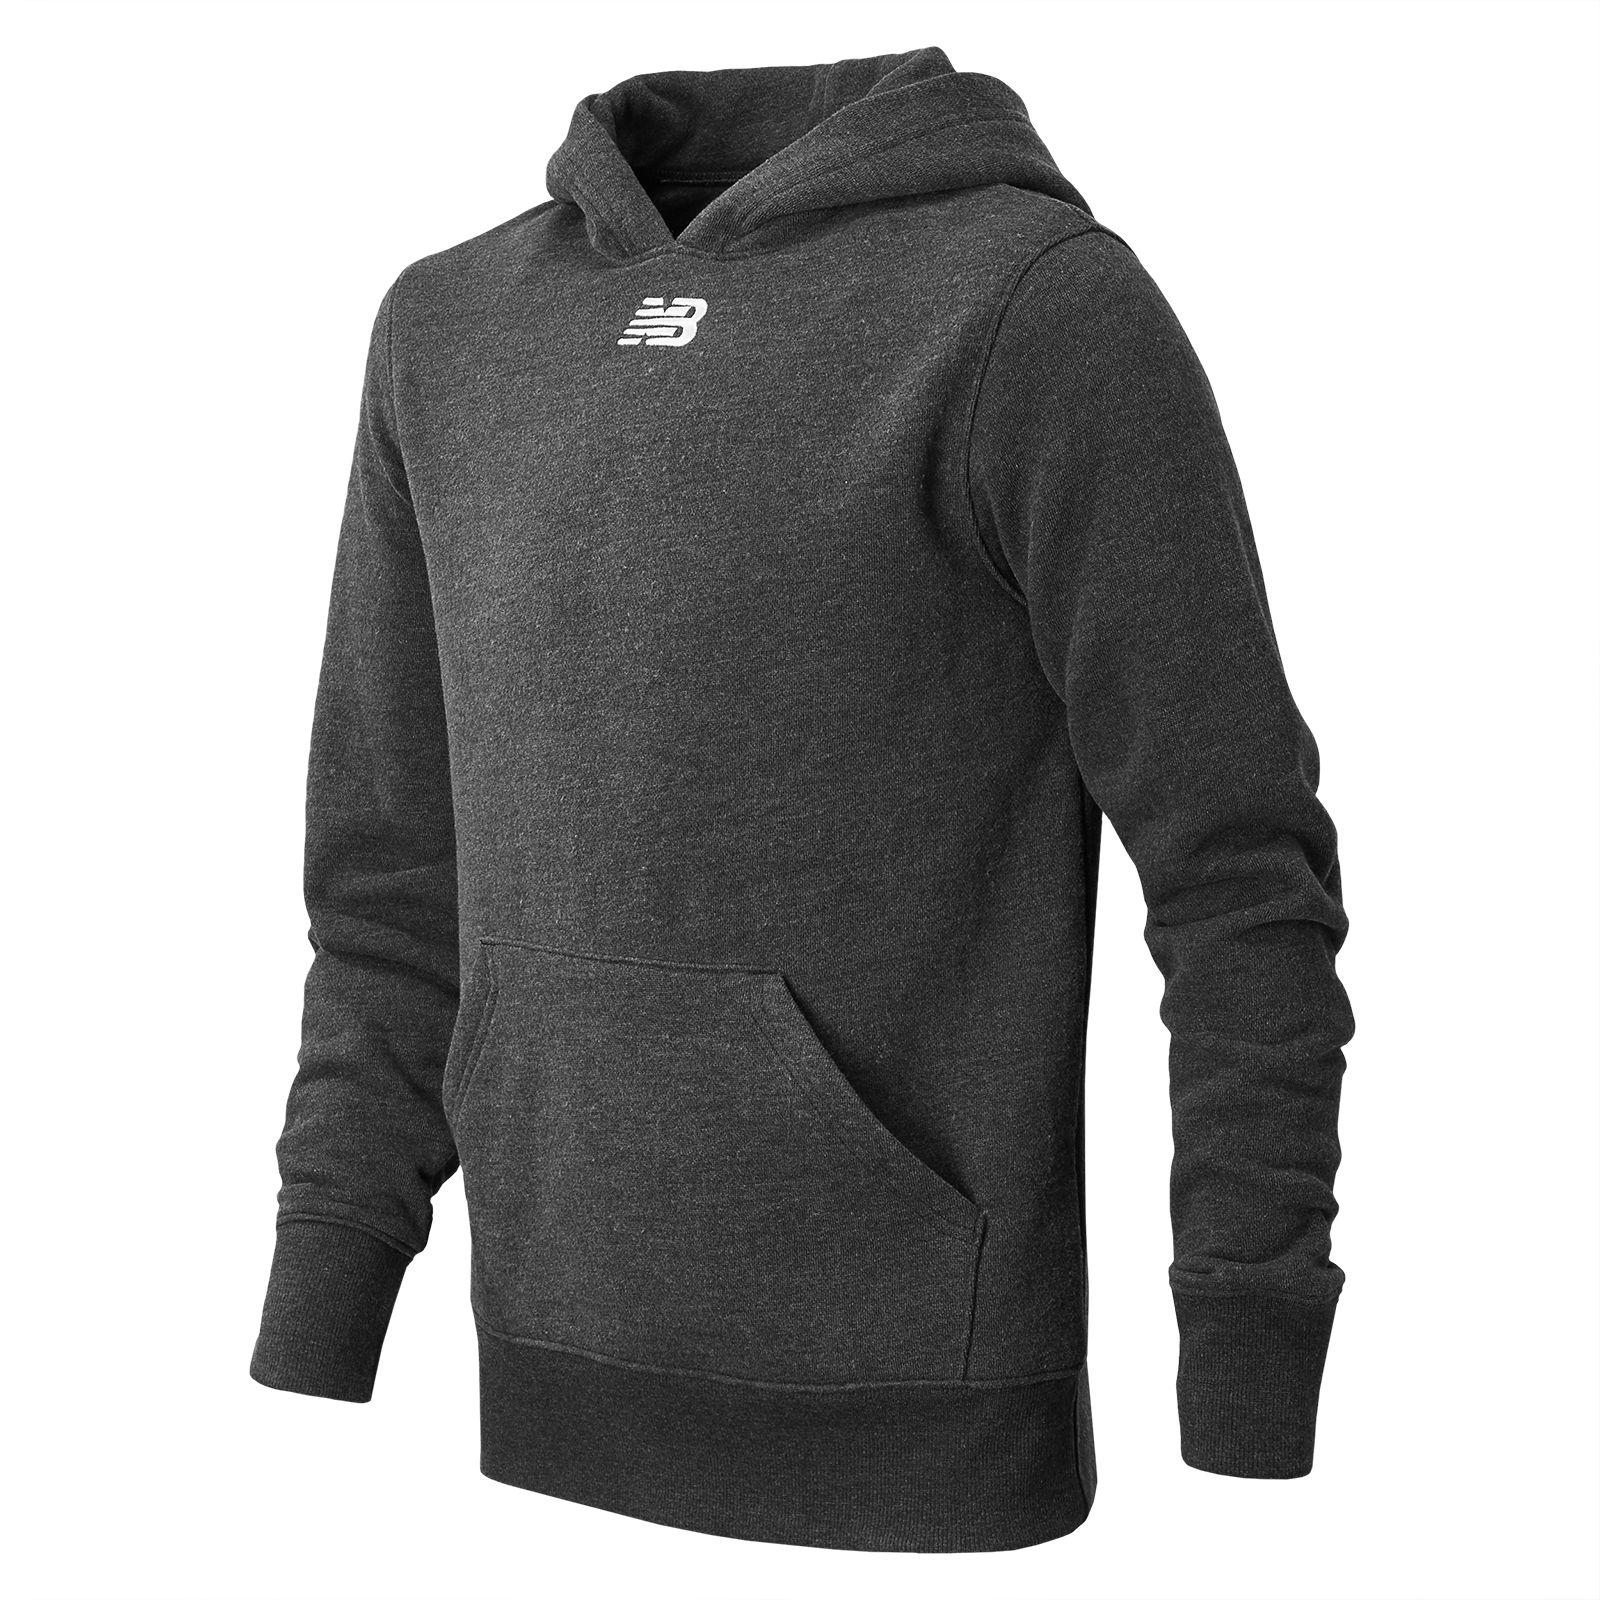 new balance classic full zip hoodie in black for men lyst. Black Bedroom Furniture Sets. Home Design Ideas